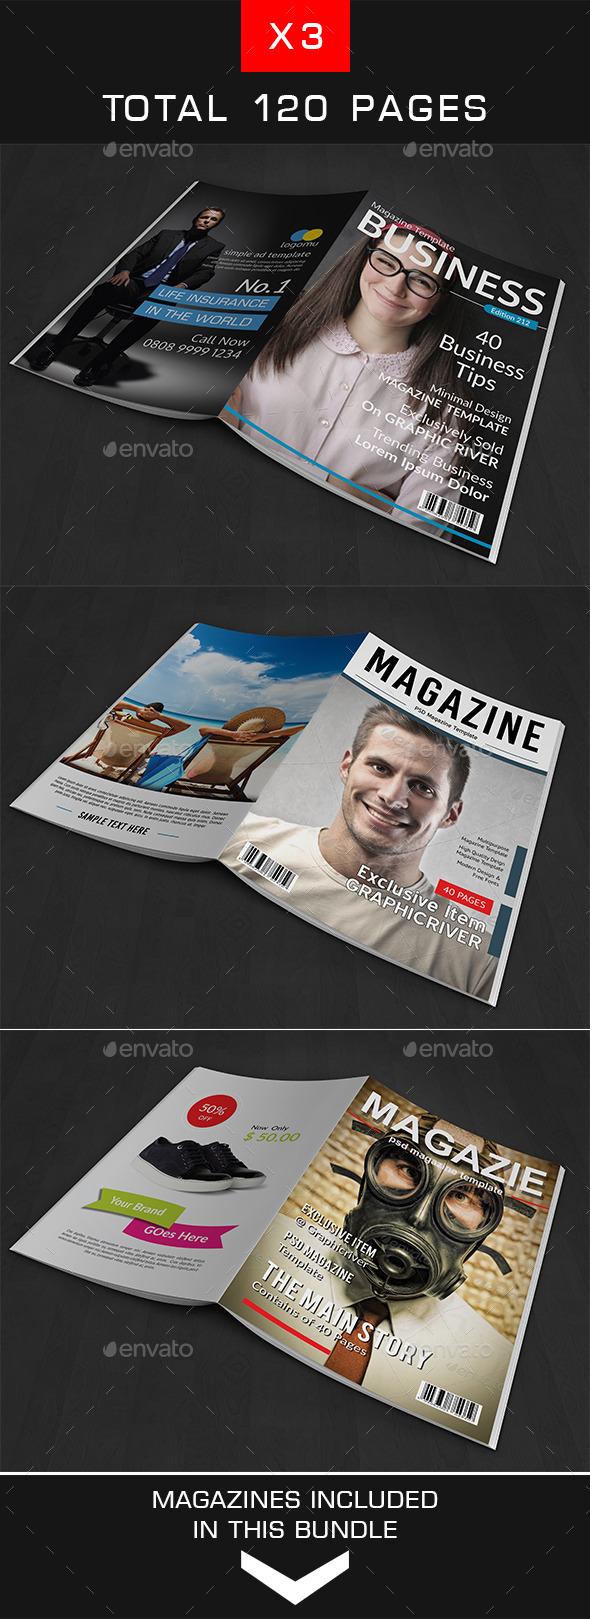 GraphicRiver A4 Magazine Bundle Vol 3 10640576